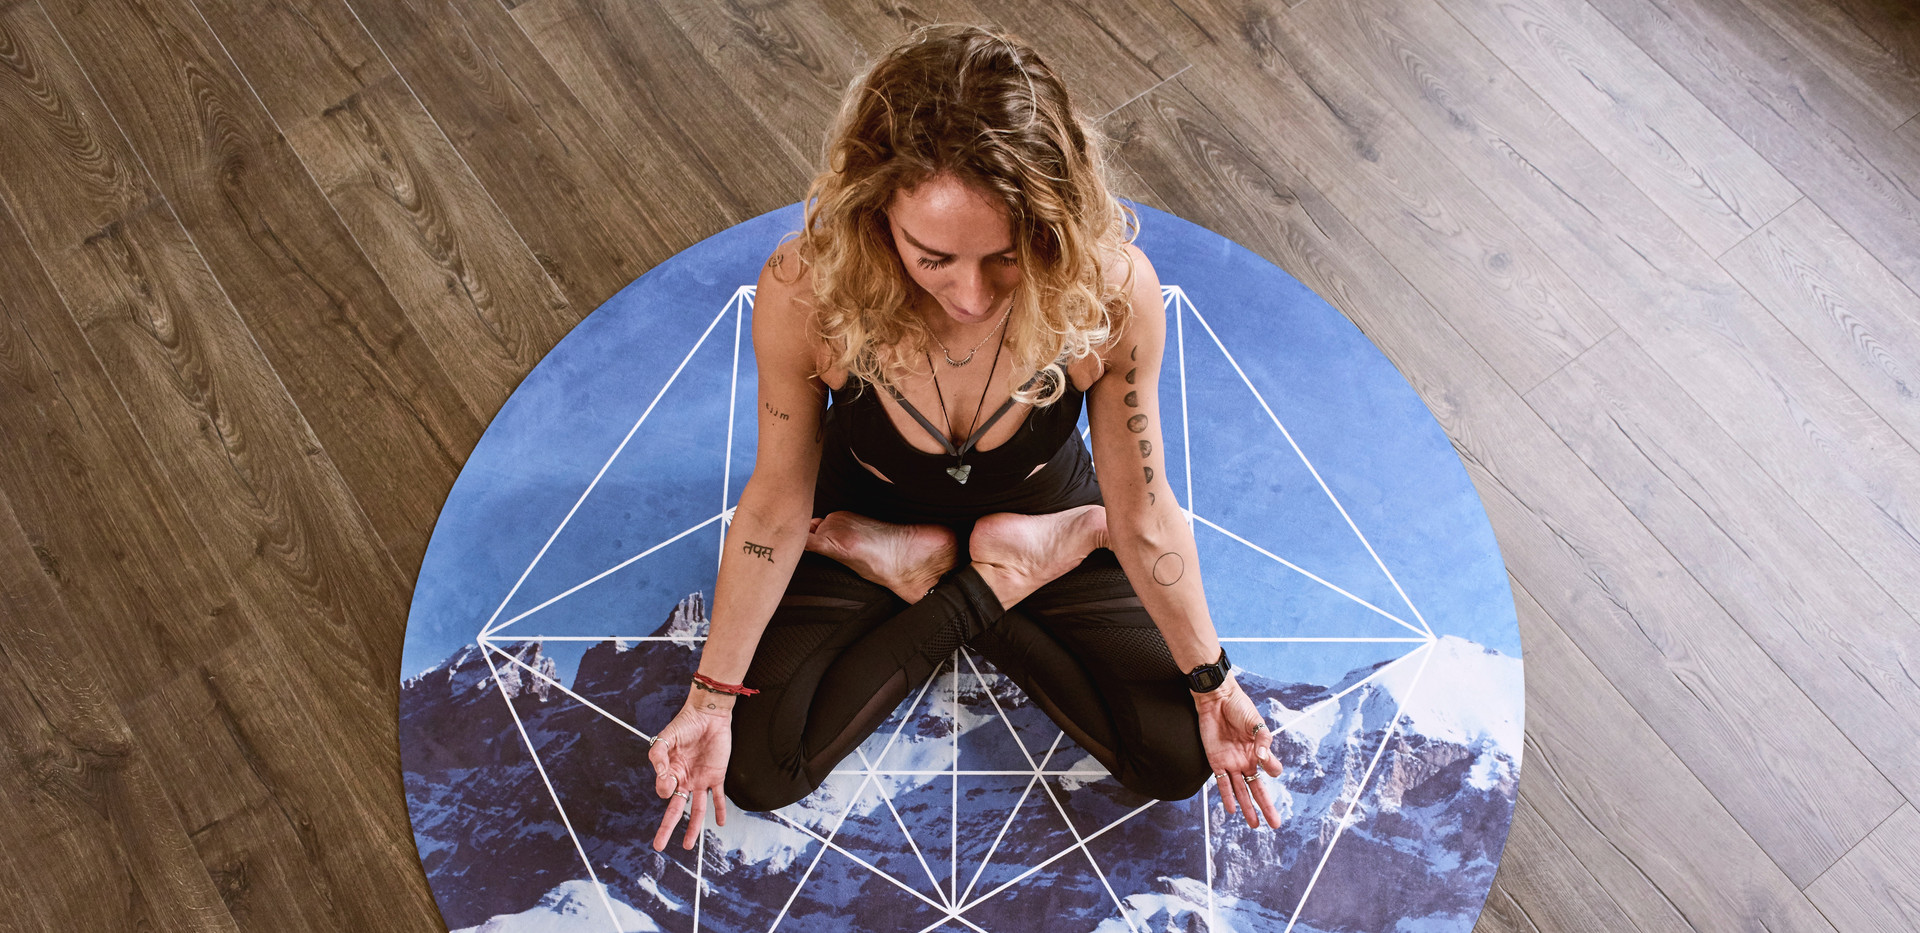 acro-yoga-active-activity-1882028.jpg